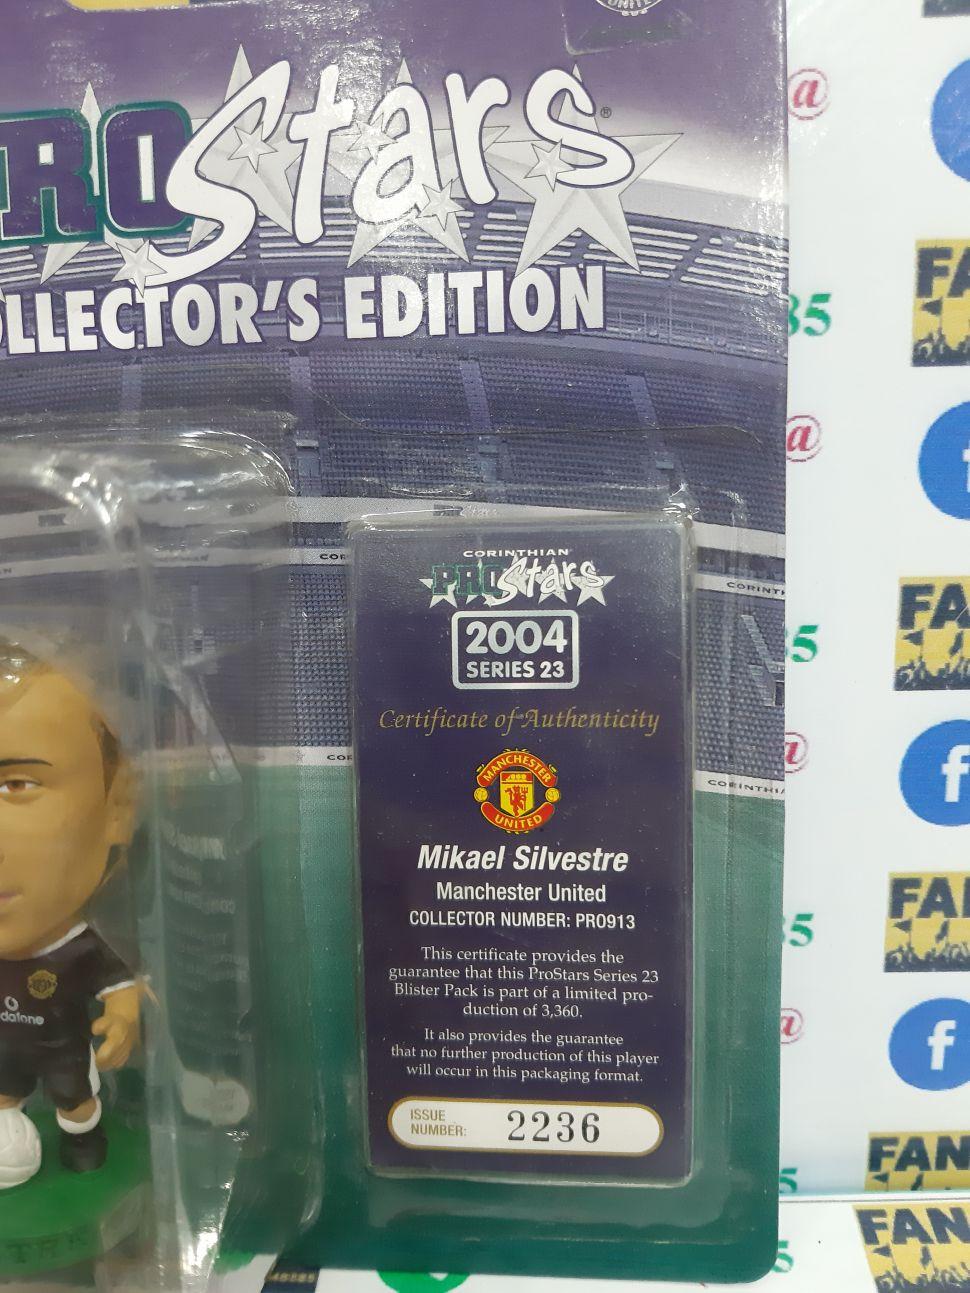 Tượng Silvestre Manchester United 2003 2005 coritnhian PRO913 blister